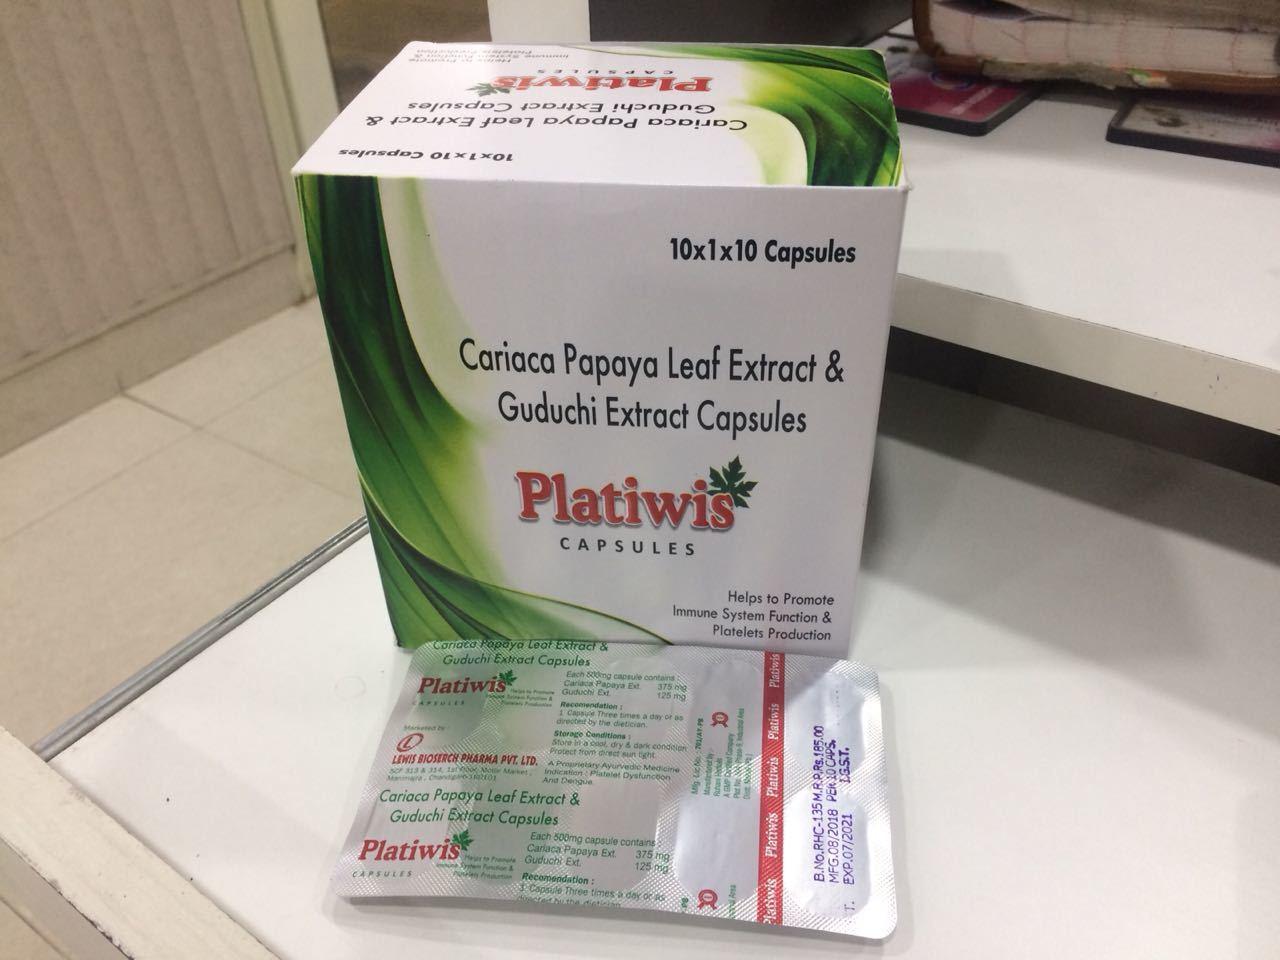 Carica Papaya Leaf And Guduchi Extract Capsule